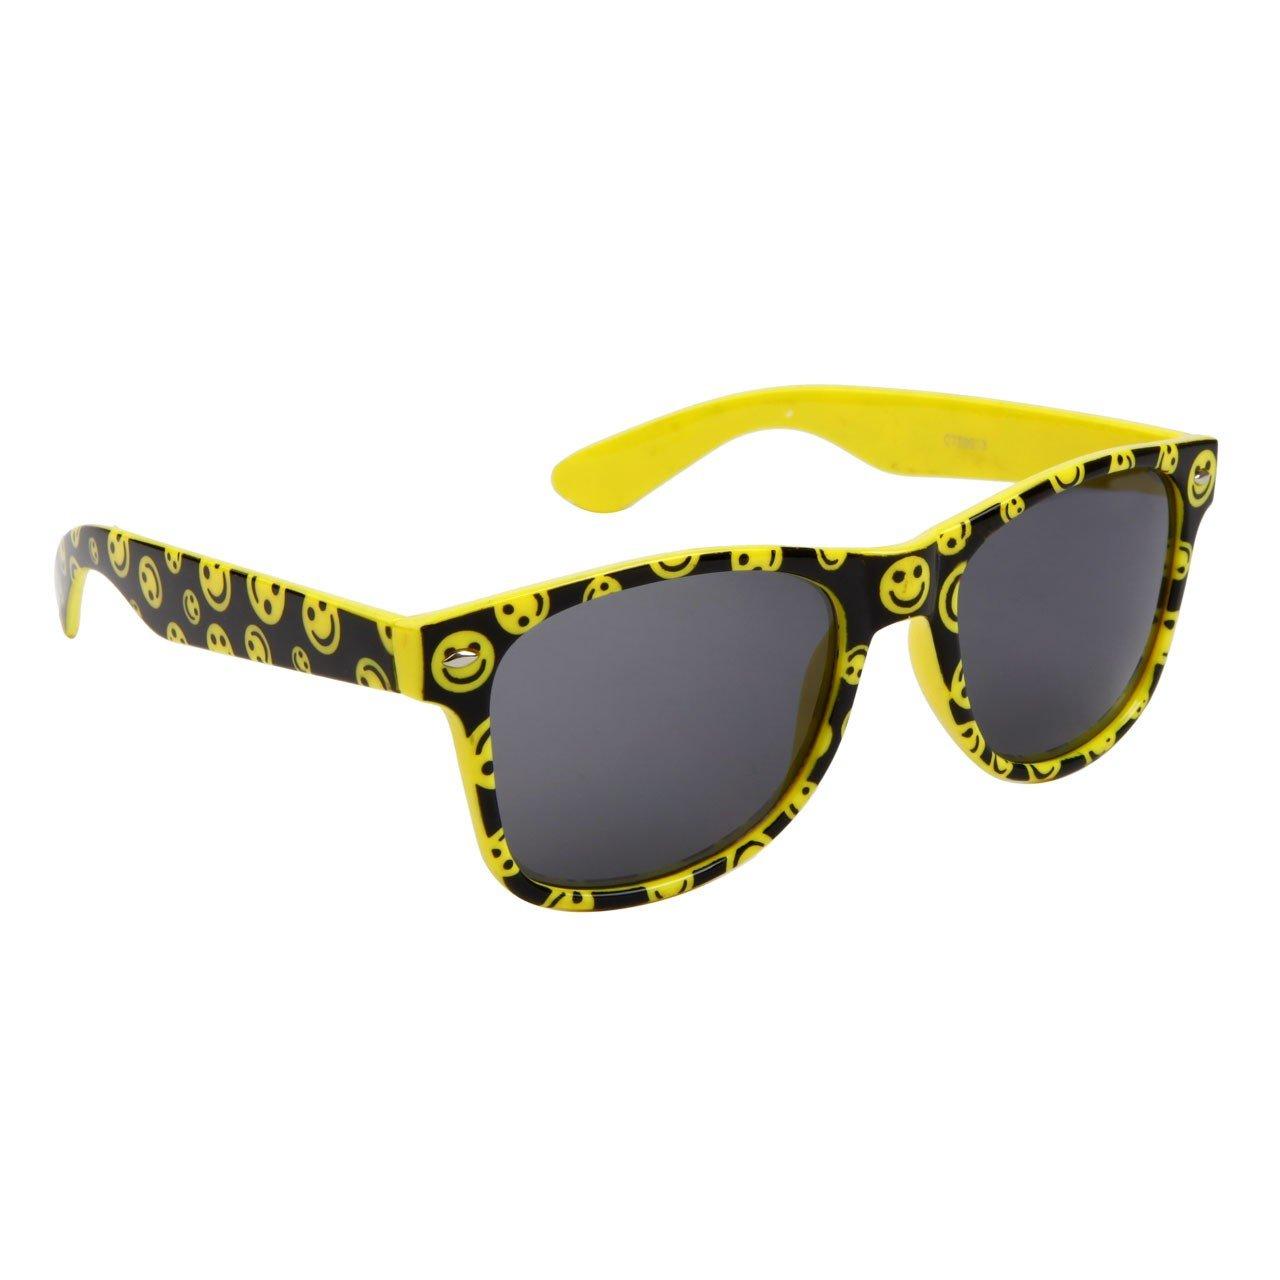 Yellow Plastic Frame Sunglasses : YELLOW HAPPY FACE PLASTIC FRAME WAYFARER STYLE SUNGLASSES